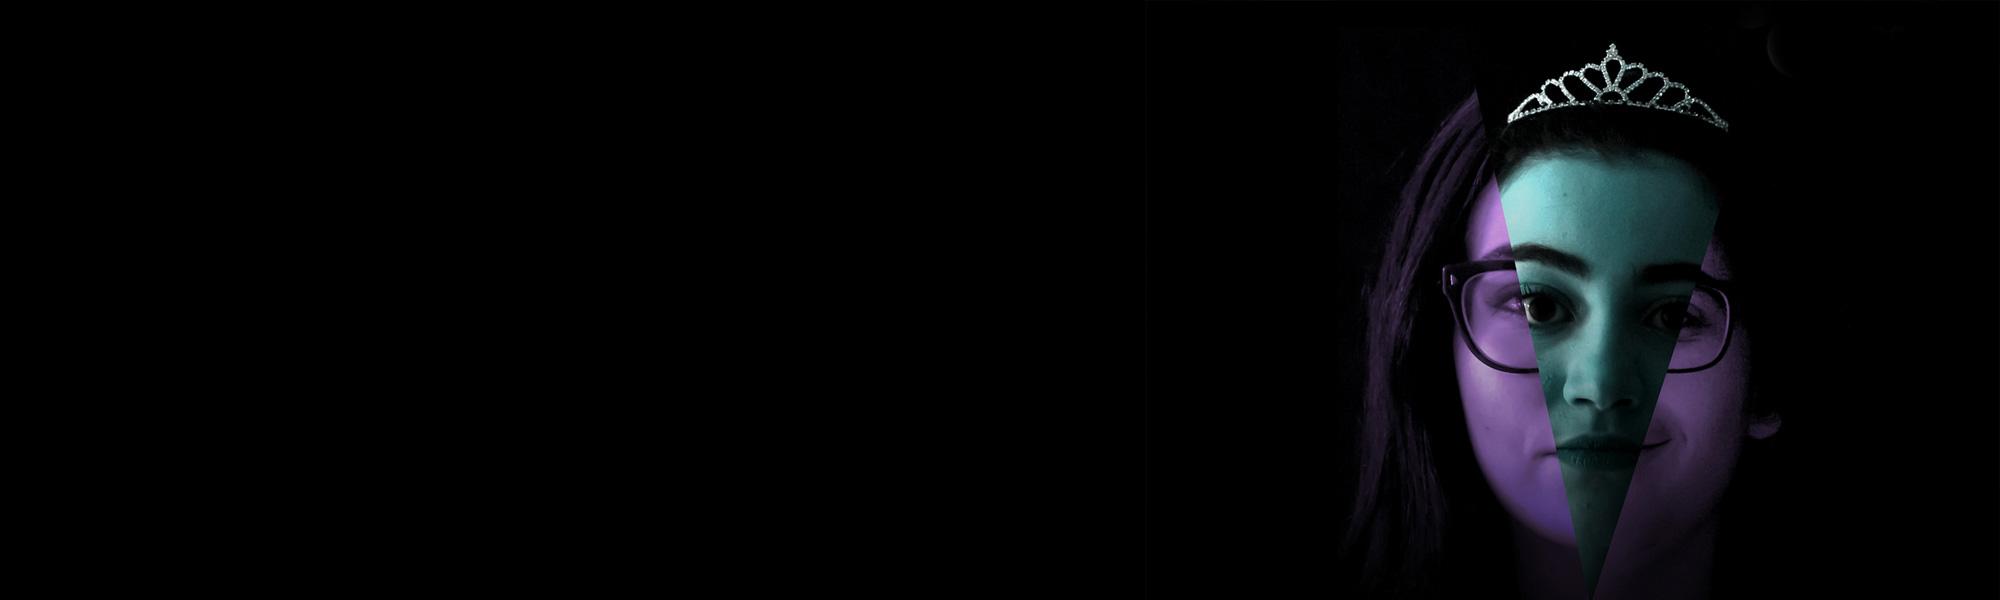 Teenage girl on dark background